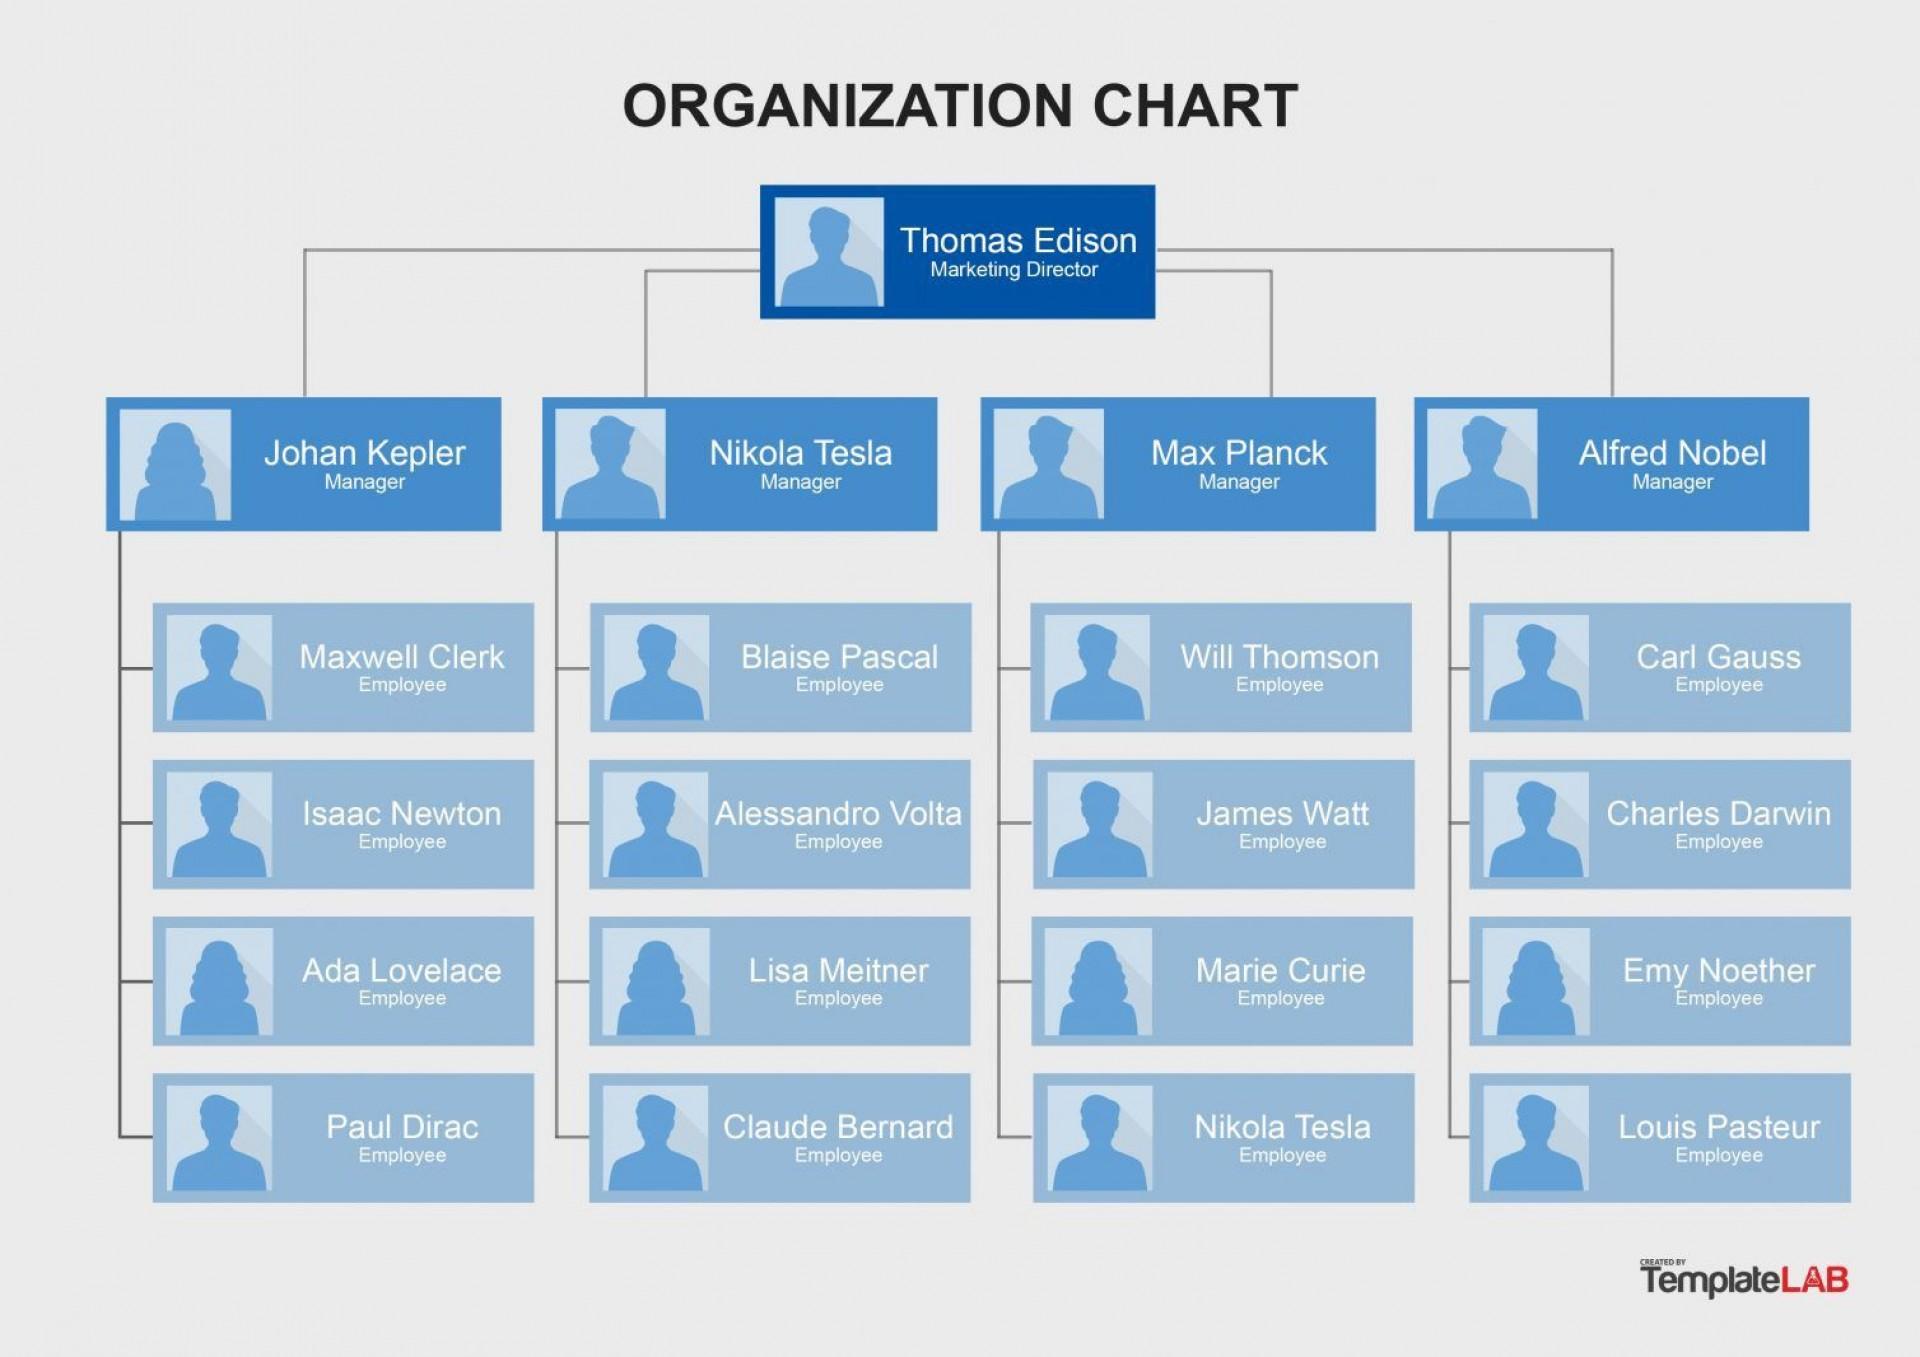 007 Remarkable Organization Chart Template Excel 2010 High Def  Org Organizational1920